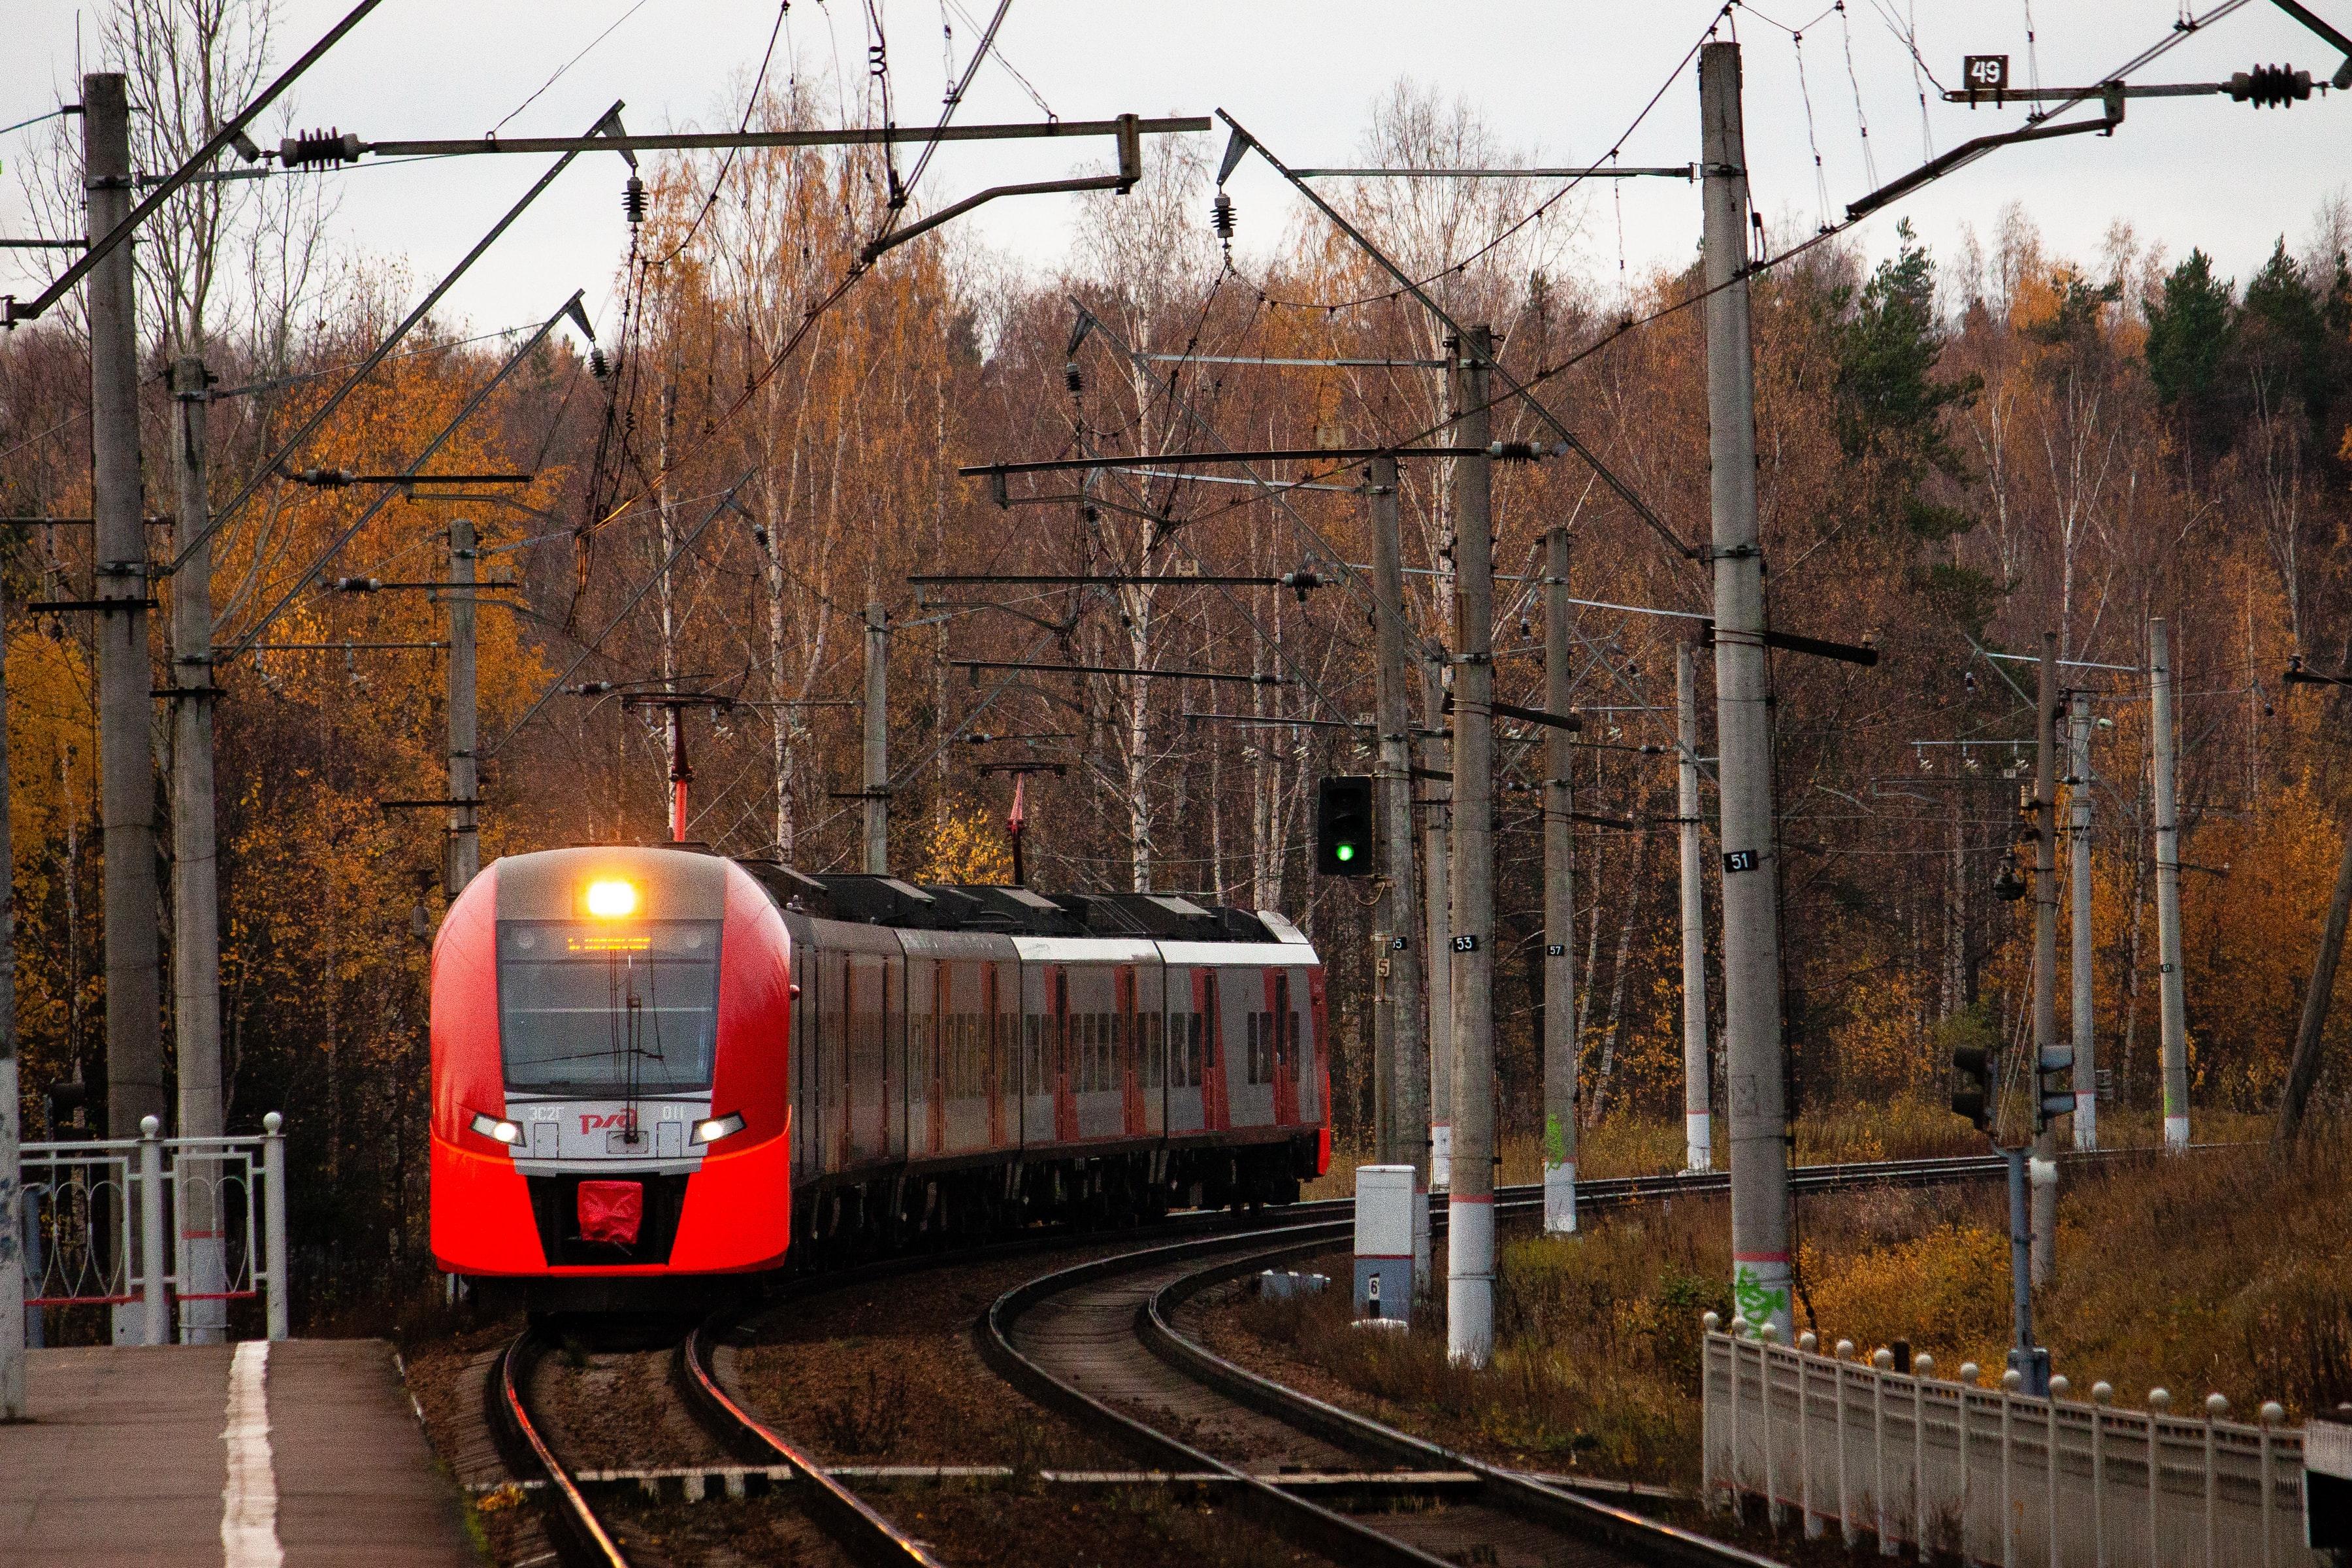 Travel by train in Croatia